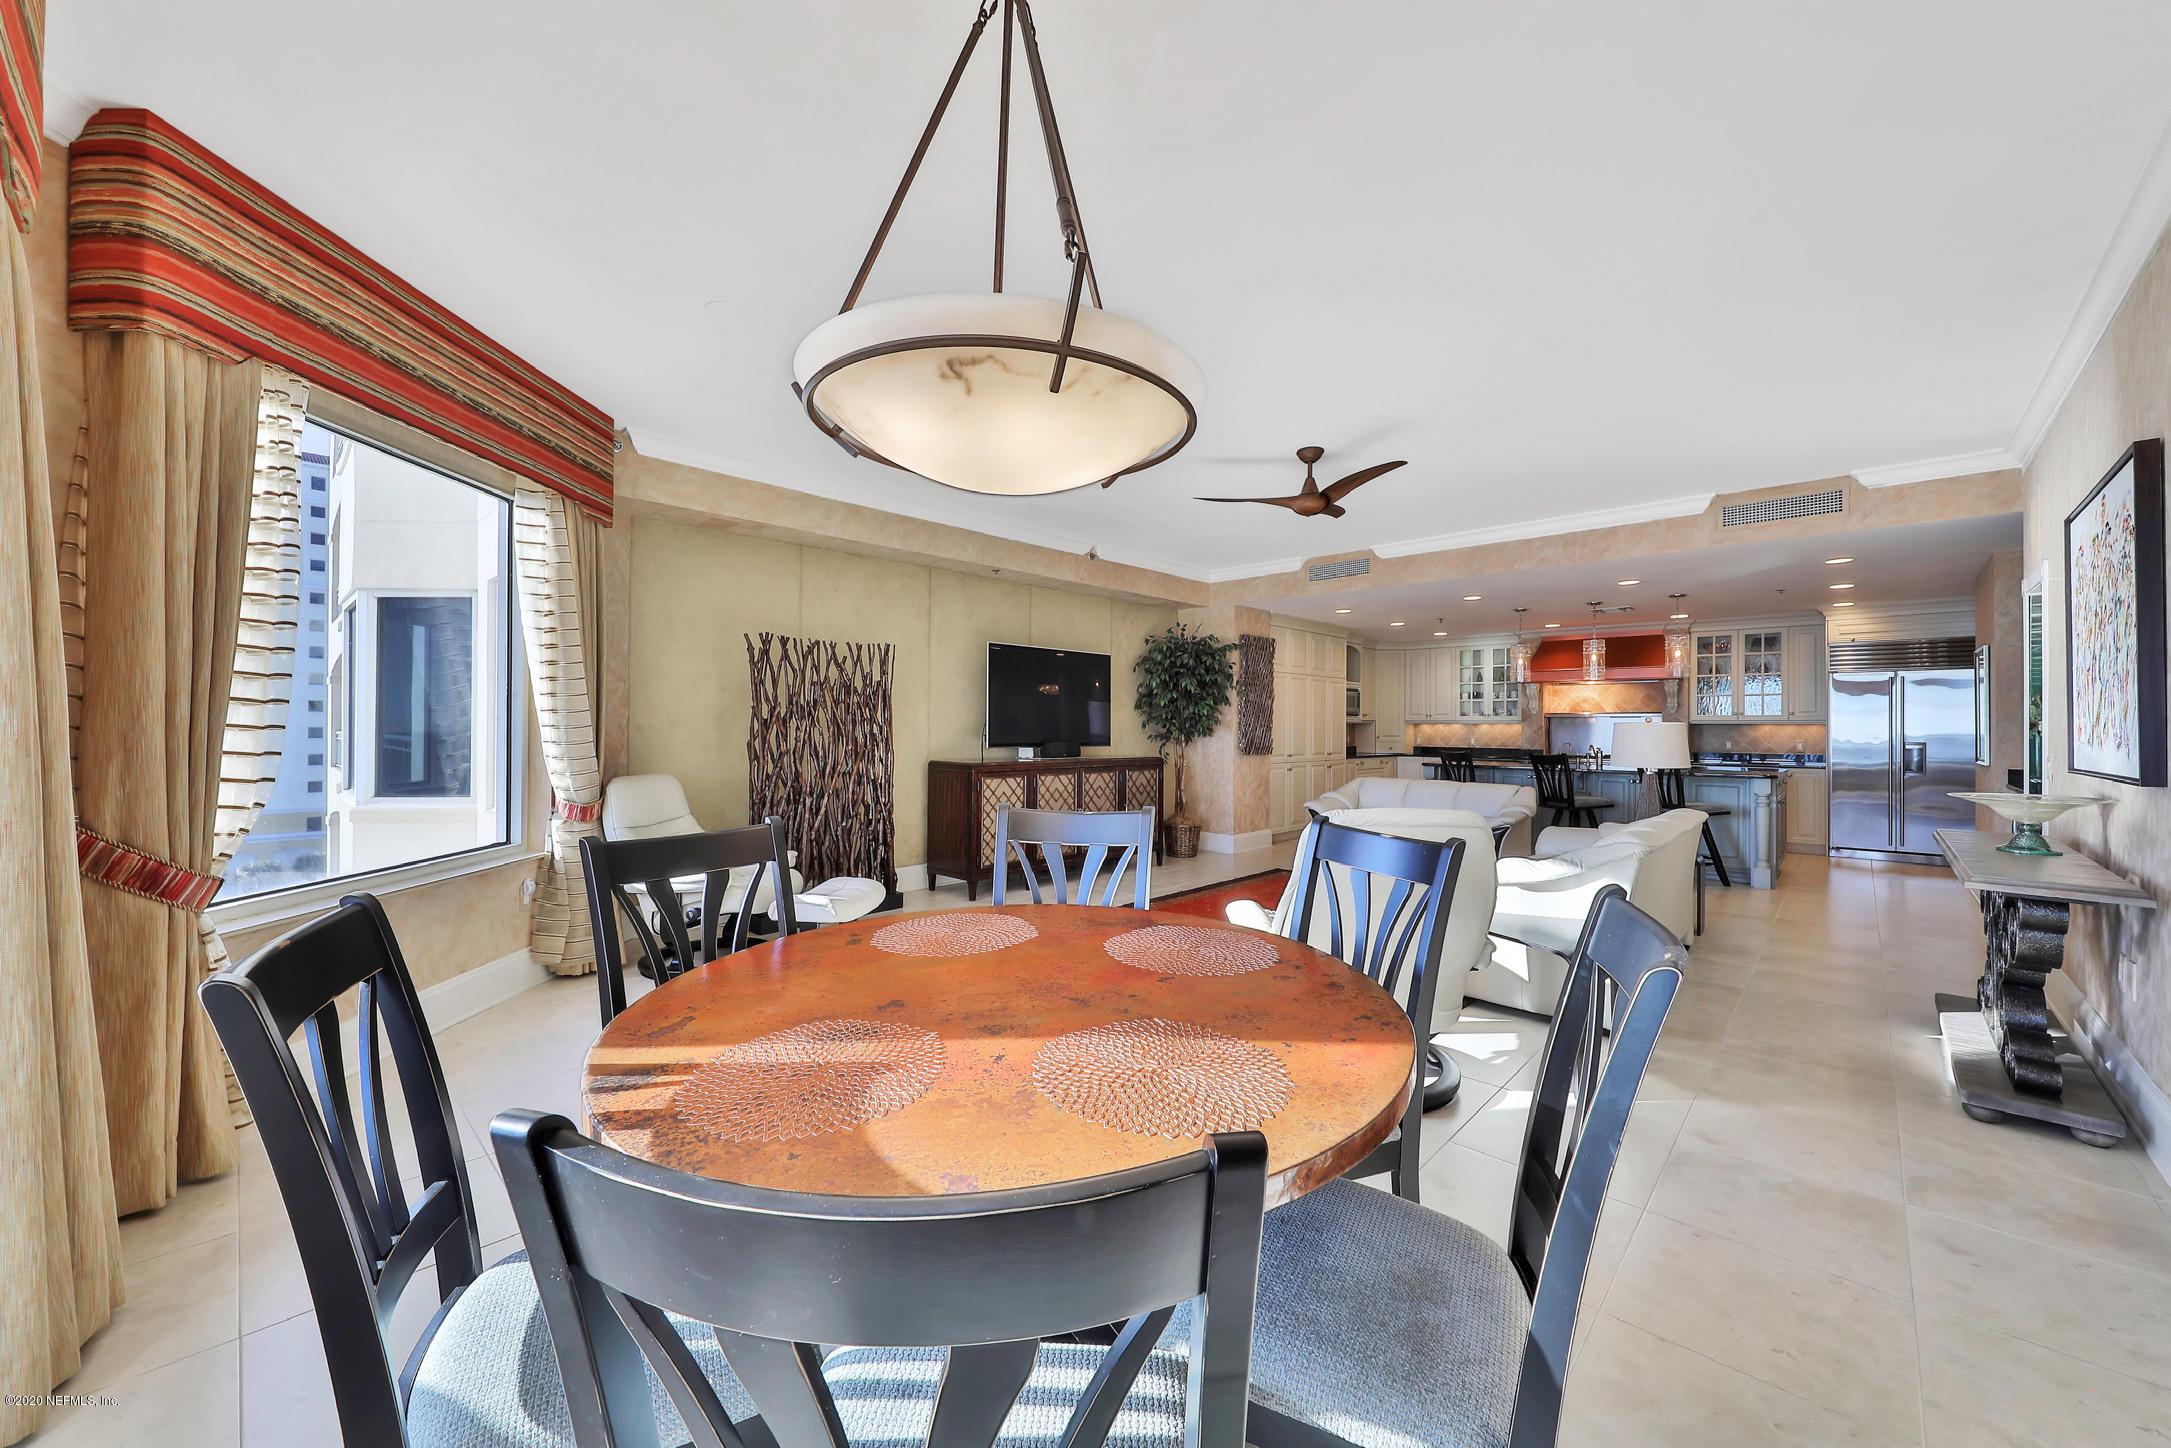 917 1ST, JACKSONVILLE BEACH, FLORIDA 32250, 4 Bedrooms Bedrooms, ,4 BathroomsBathrooms,Residential,For sale,1ST,1069210